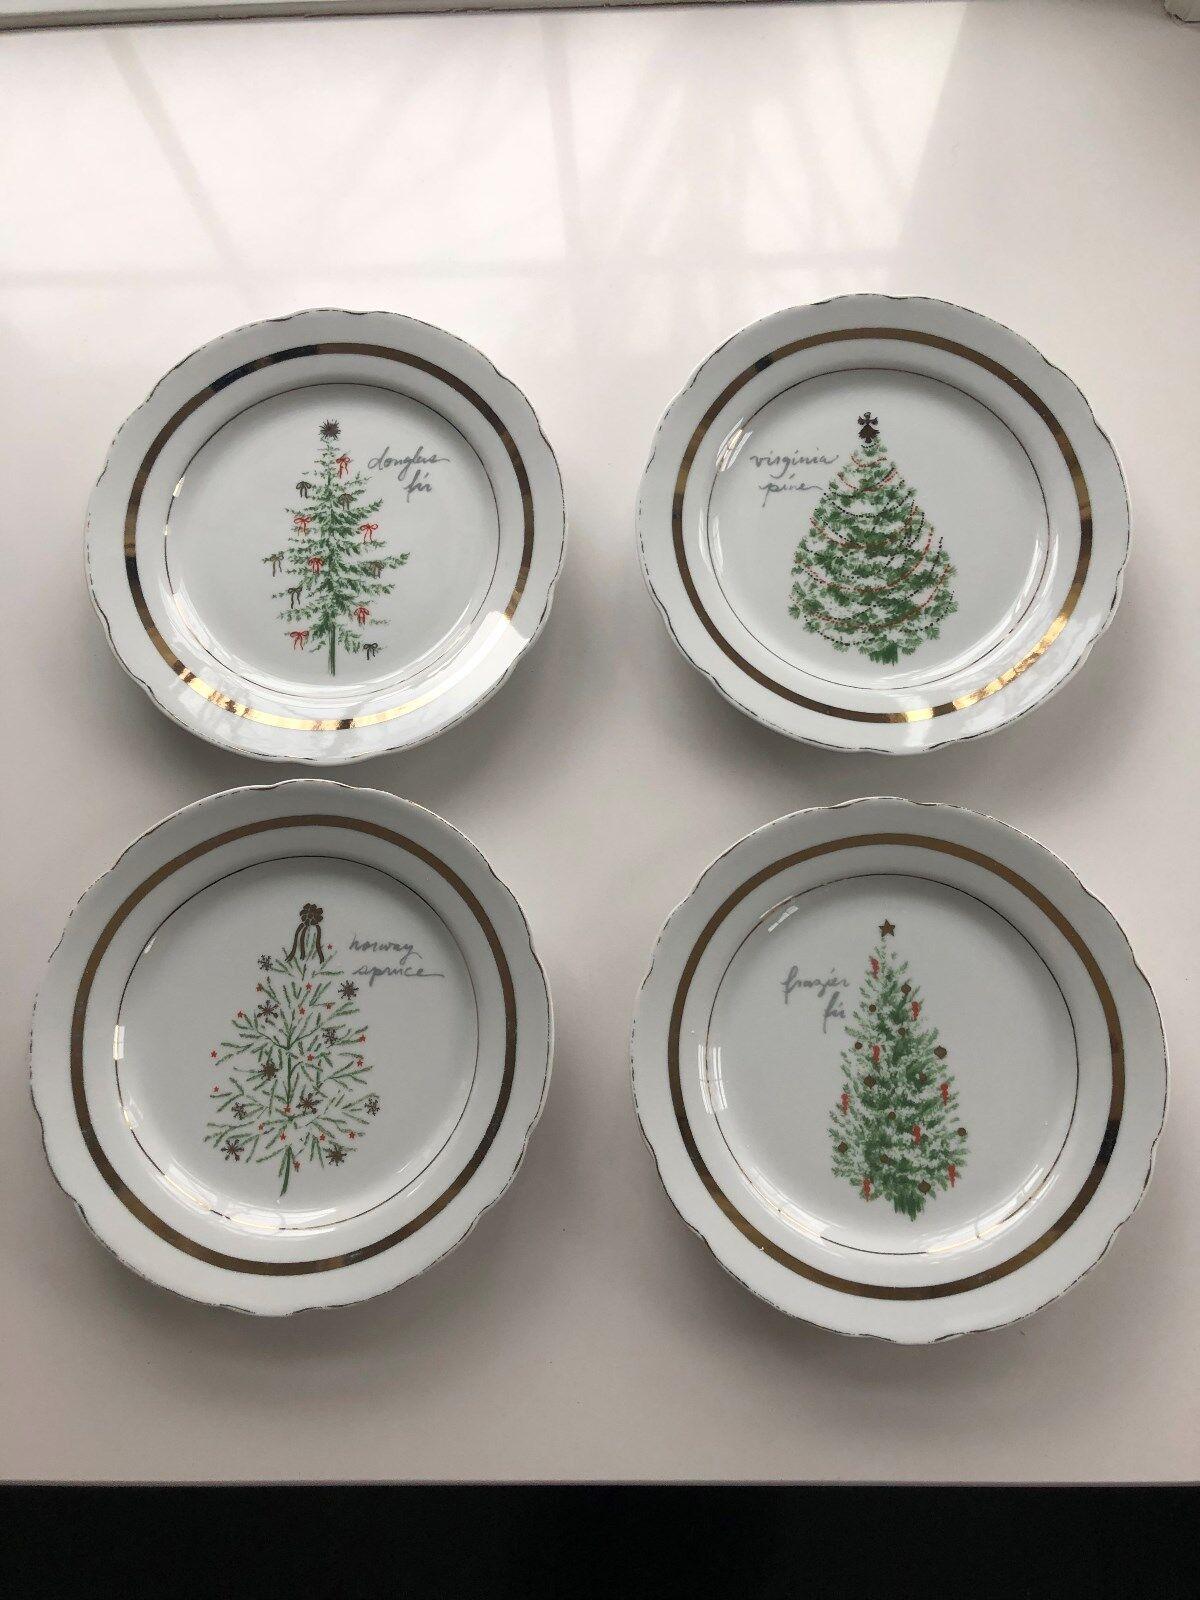 Pottery Barn Vintage Christmas Tree Appetizer Plates set 4 2018